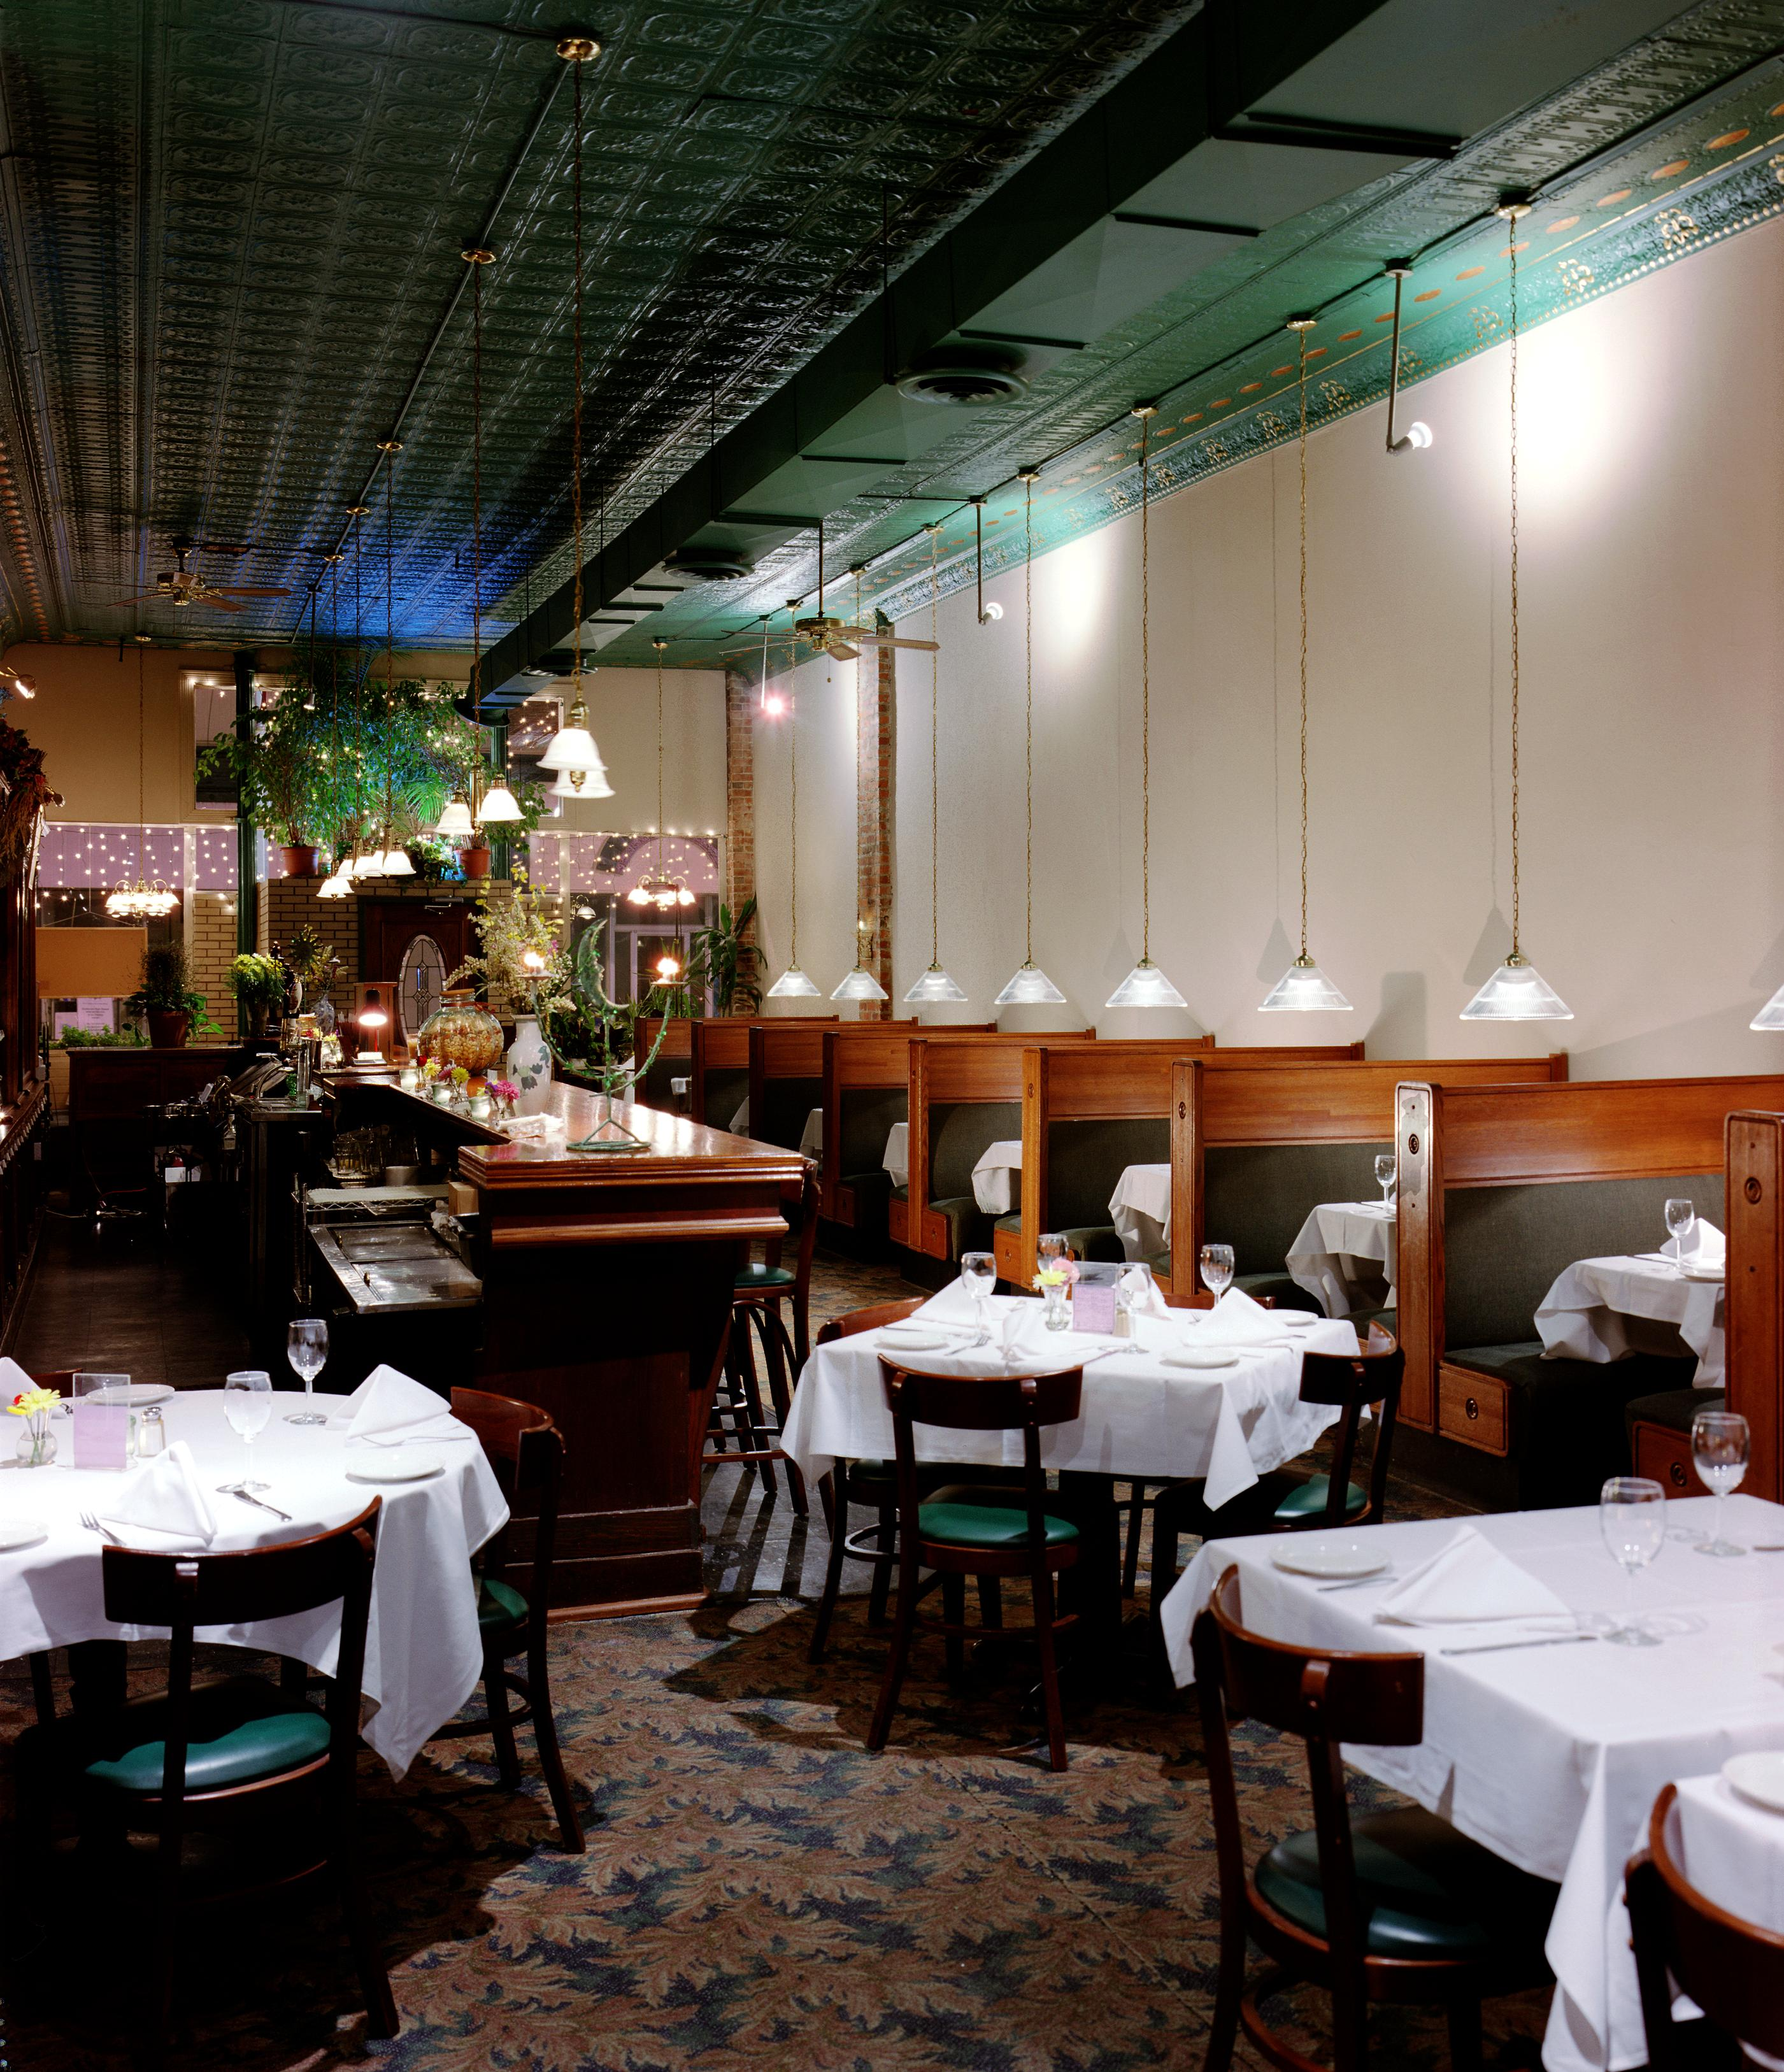 The Black Crow Restaurant And Bar